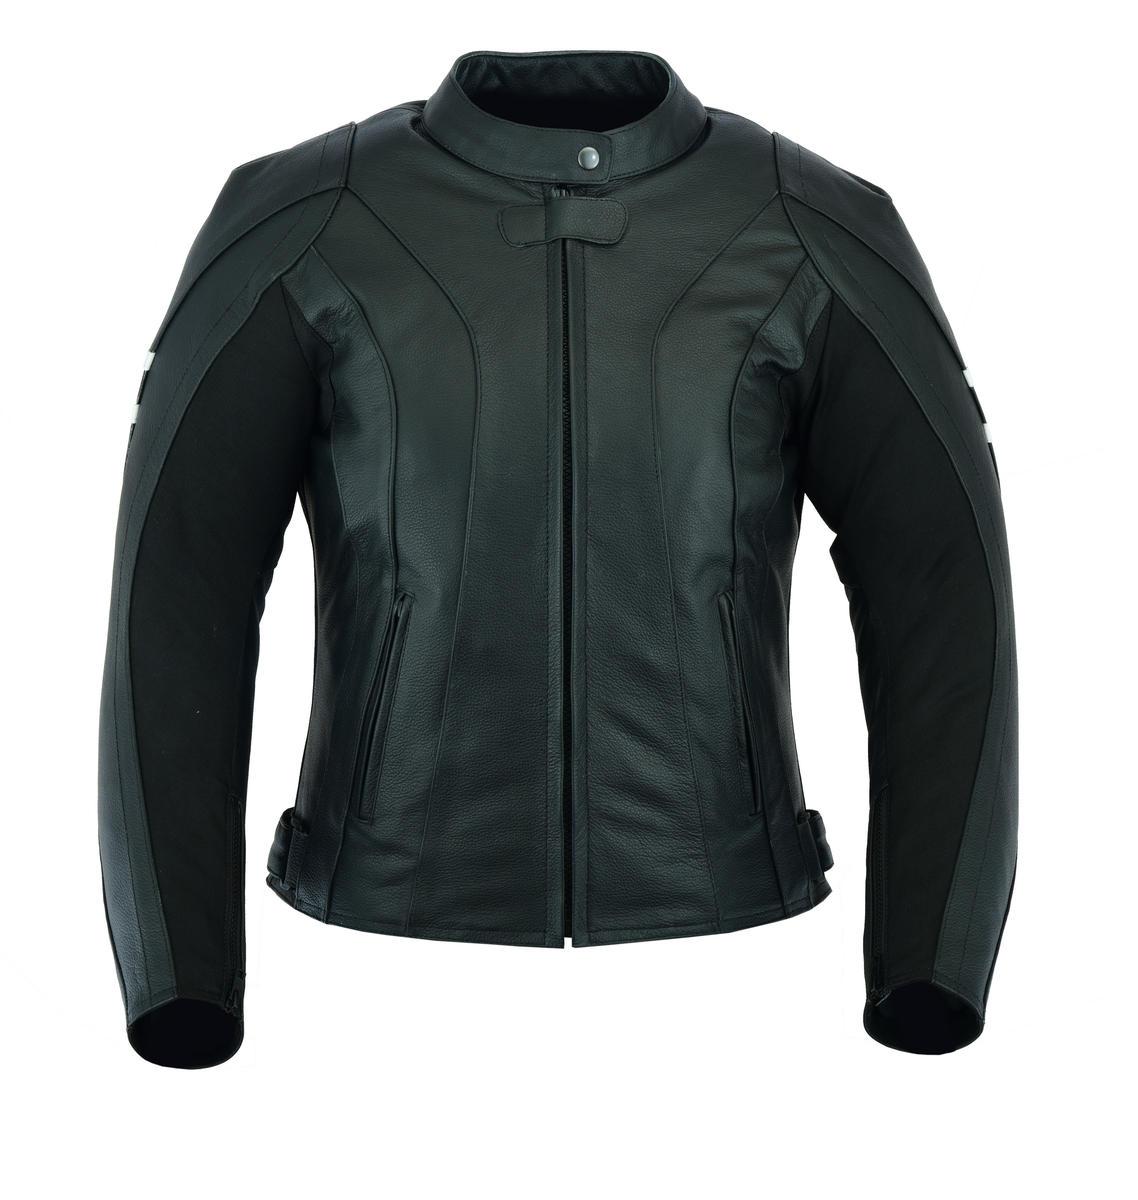 LJ-WM-RACE (Clearance Racing Leather Jacket)